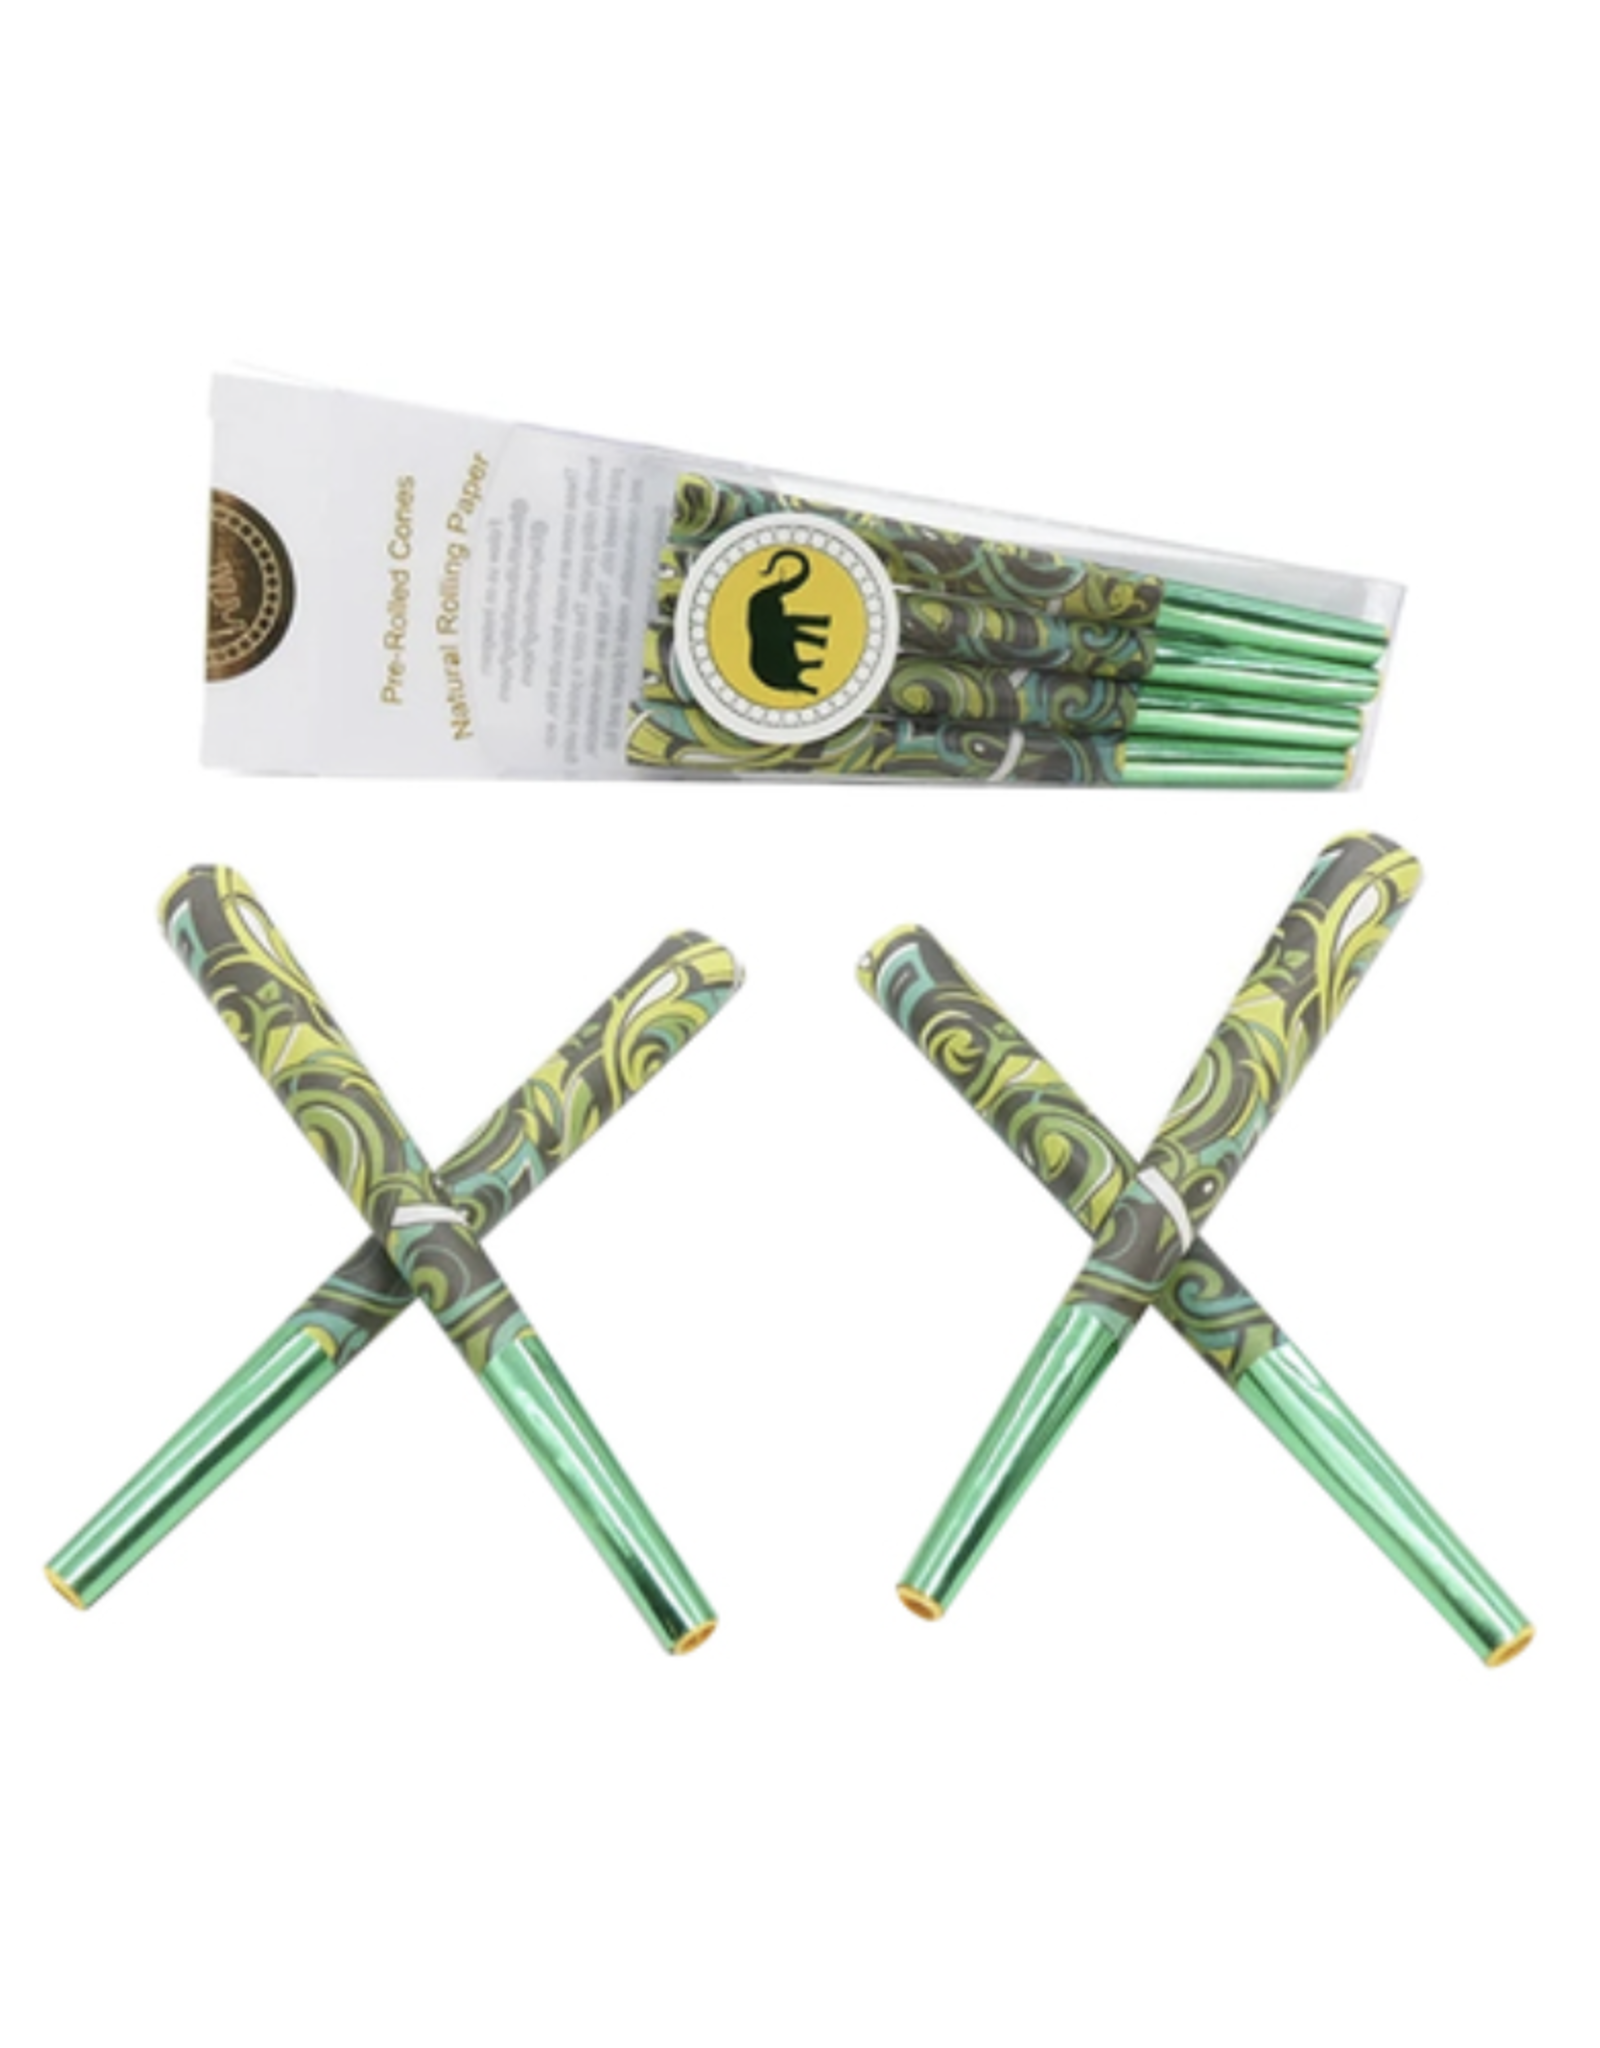 Elephant Brands Street Art - Pre-rolled Designer Cones (8 Pack)